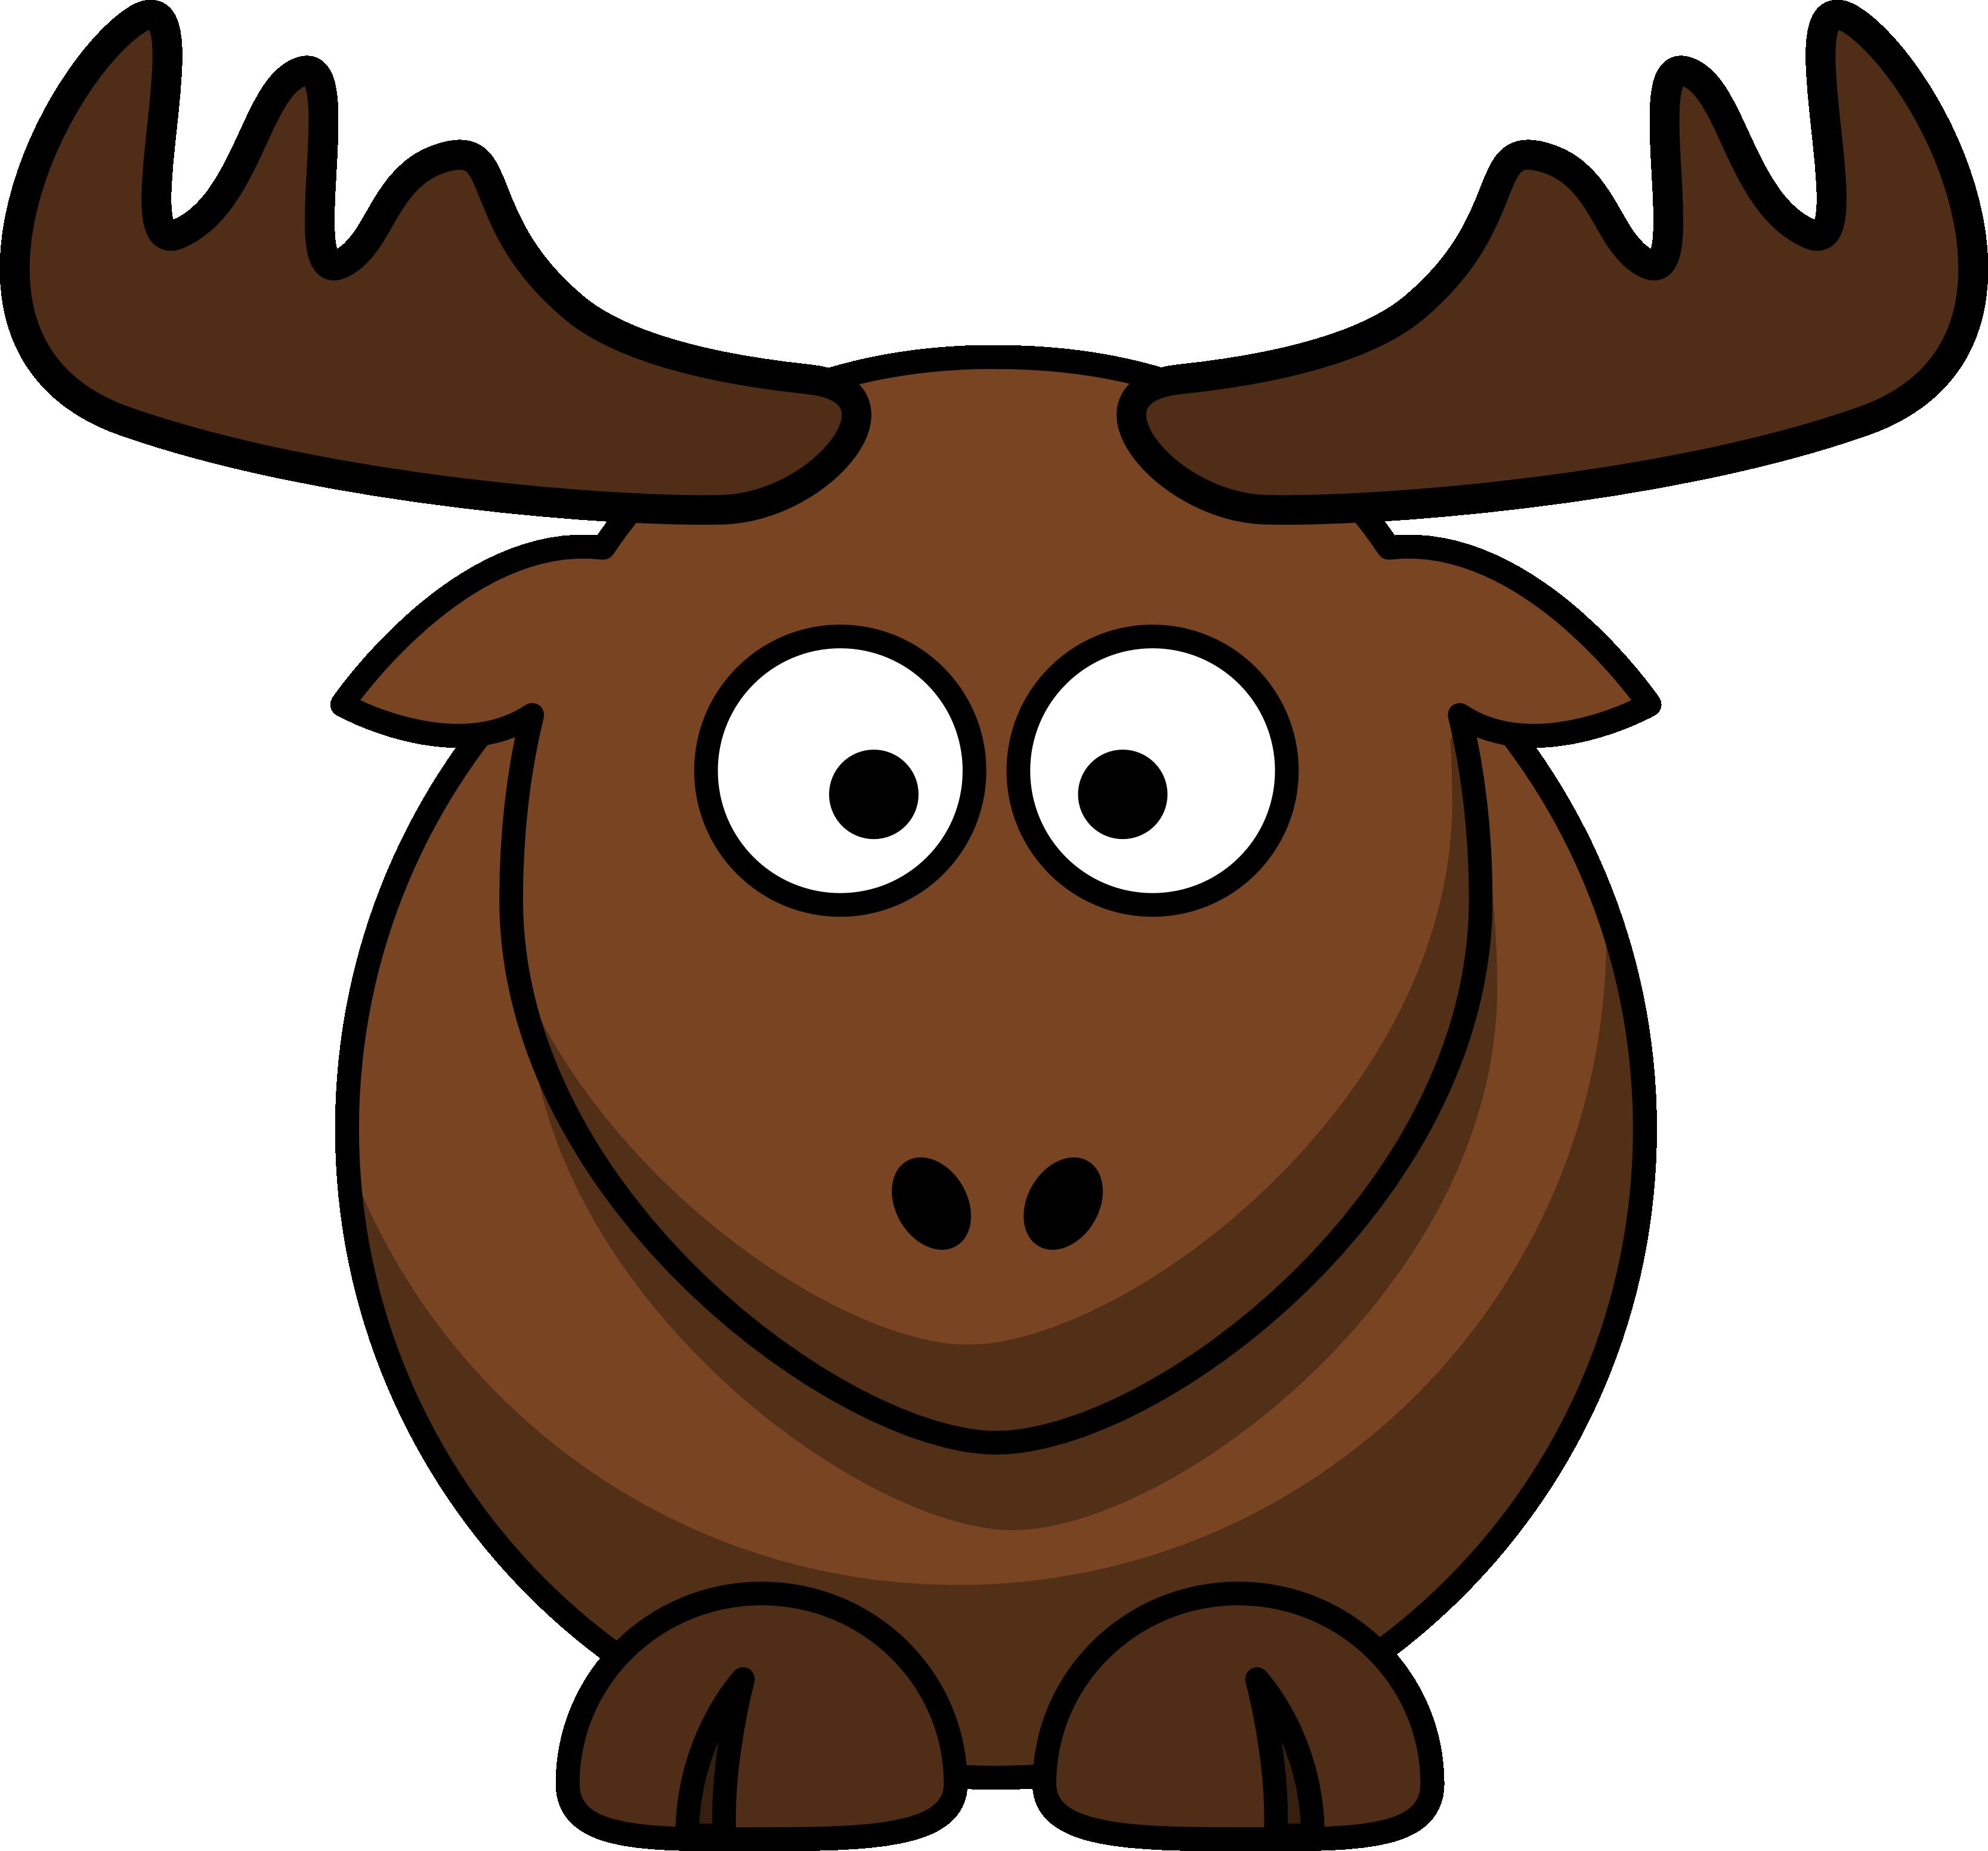 Elk clipart. Clip art panda free